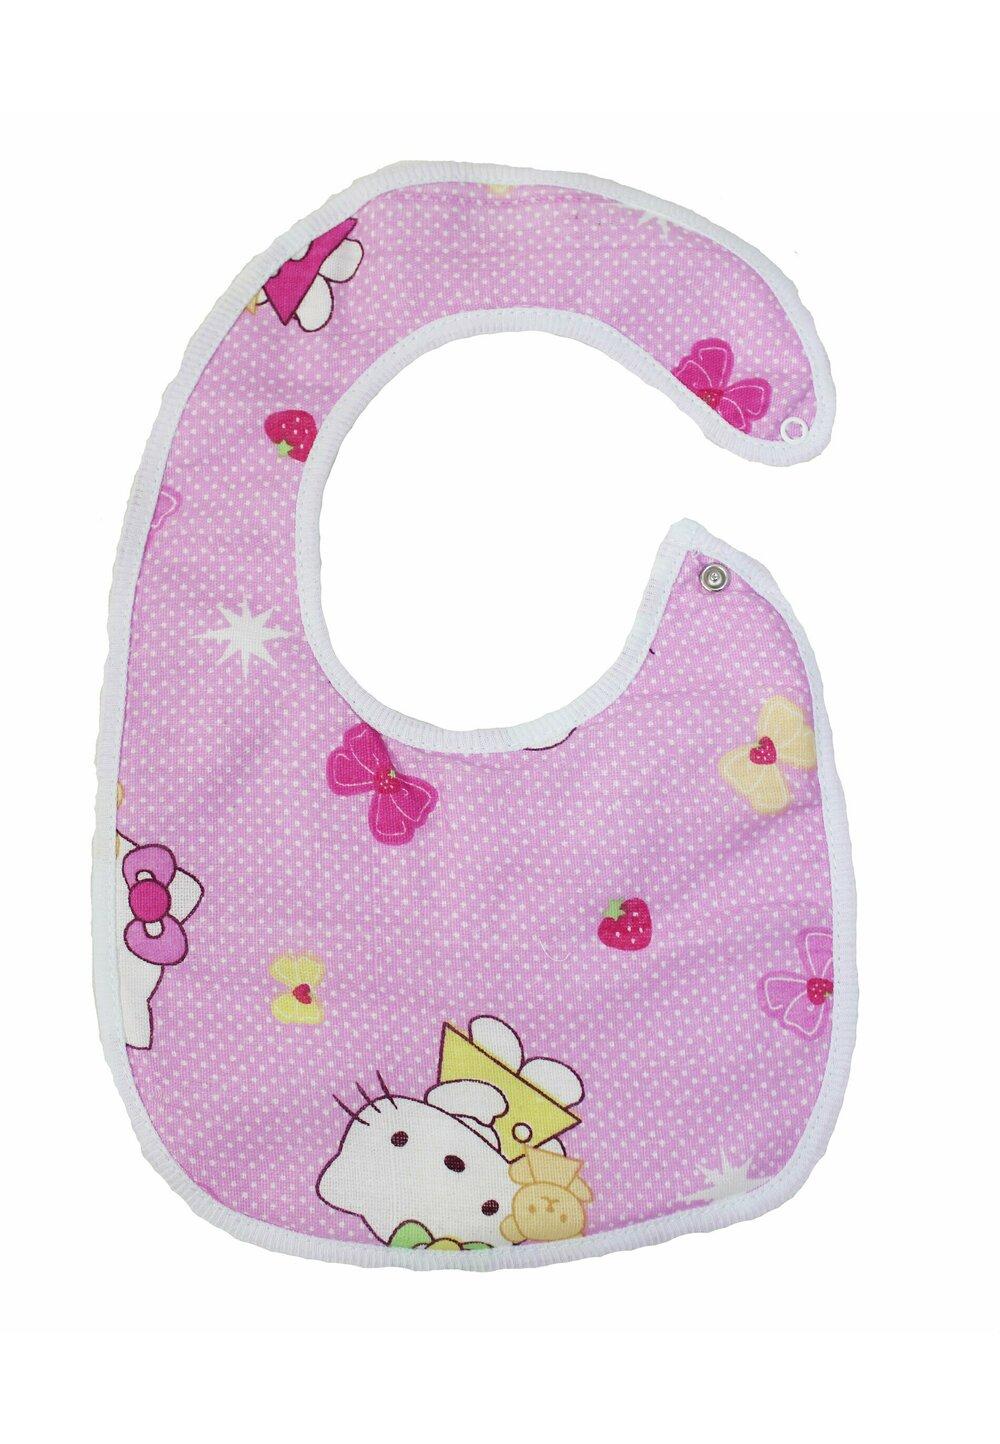 Baveta bebe, Hello Kitty, roz deschis, 0-6 luni imagine